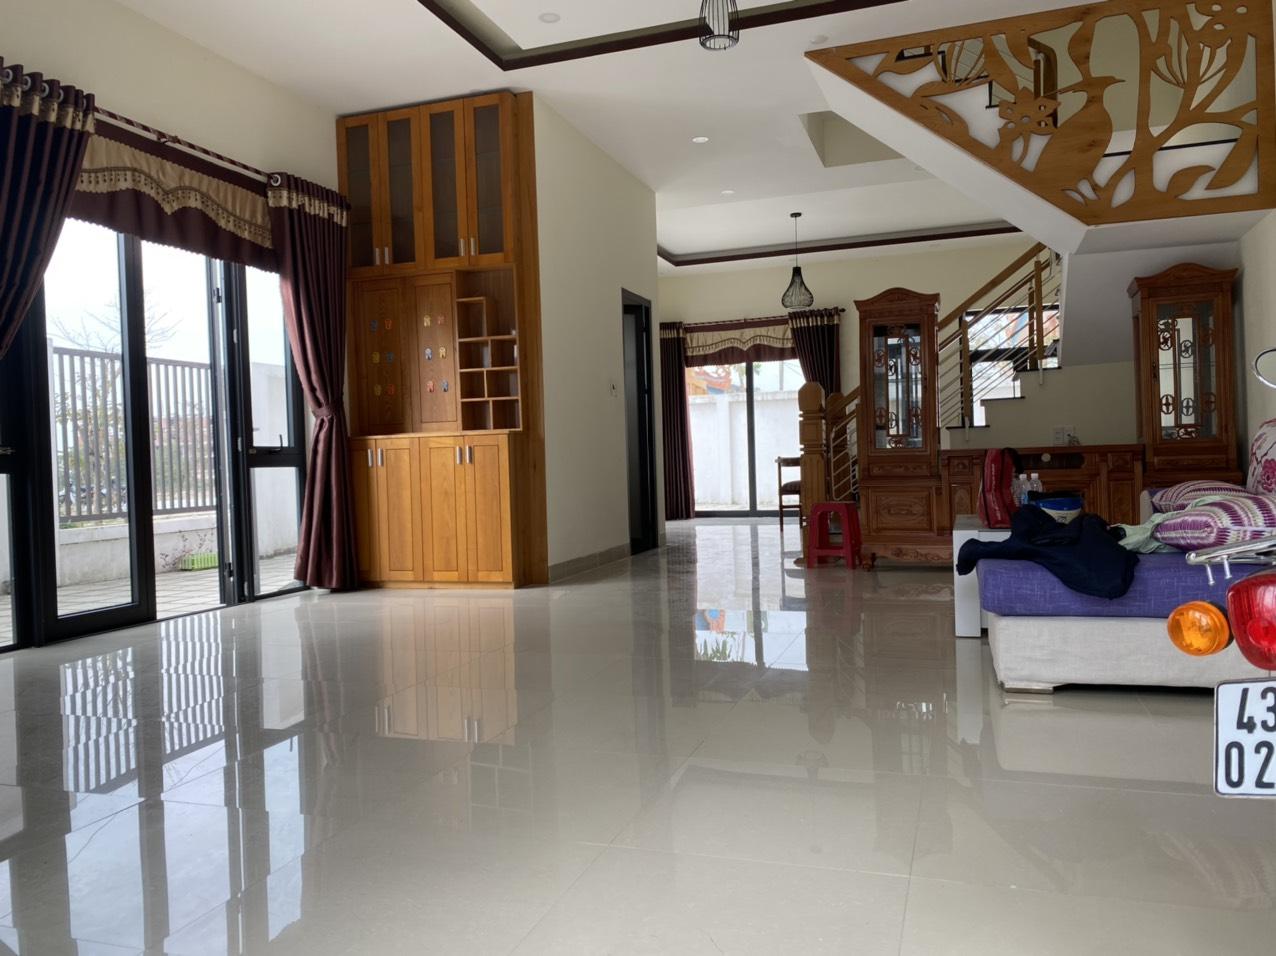 House 3 bedrooms FPT city Da Nang – B735